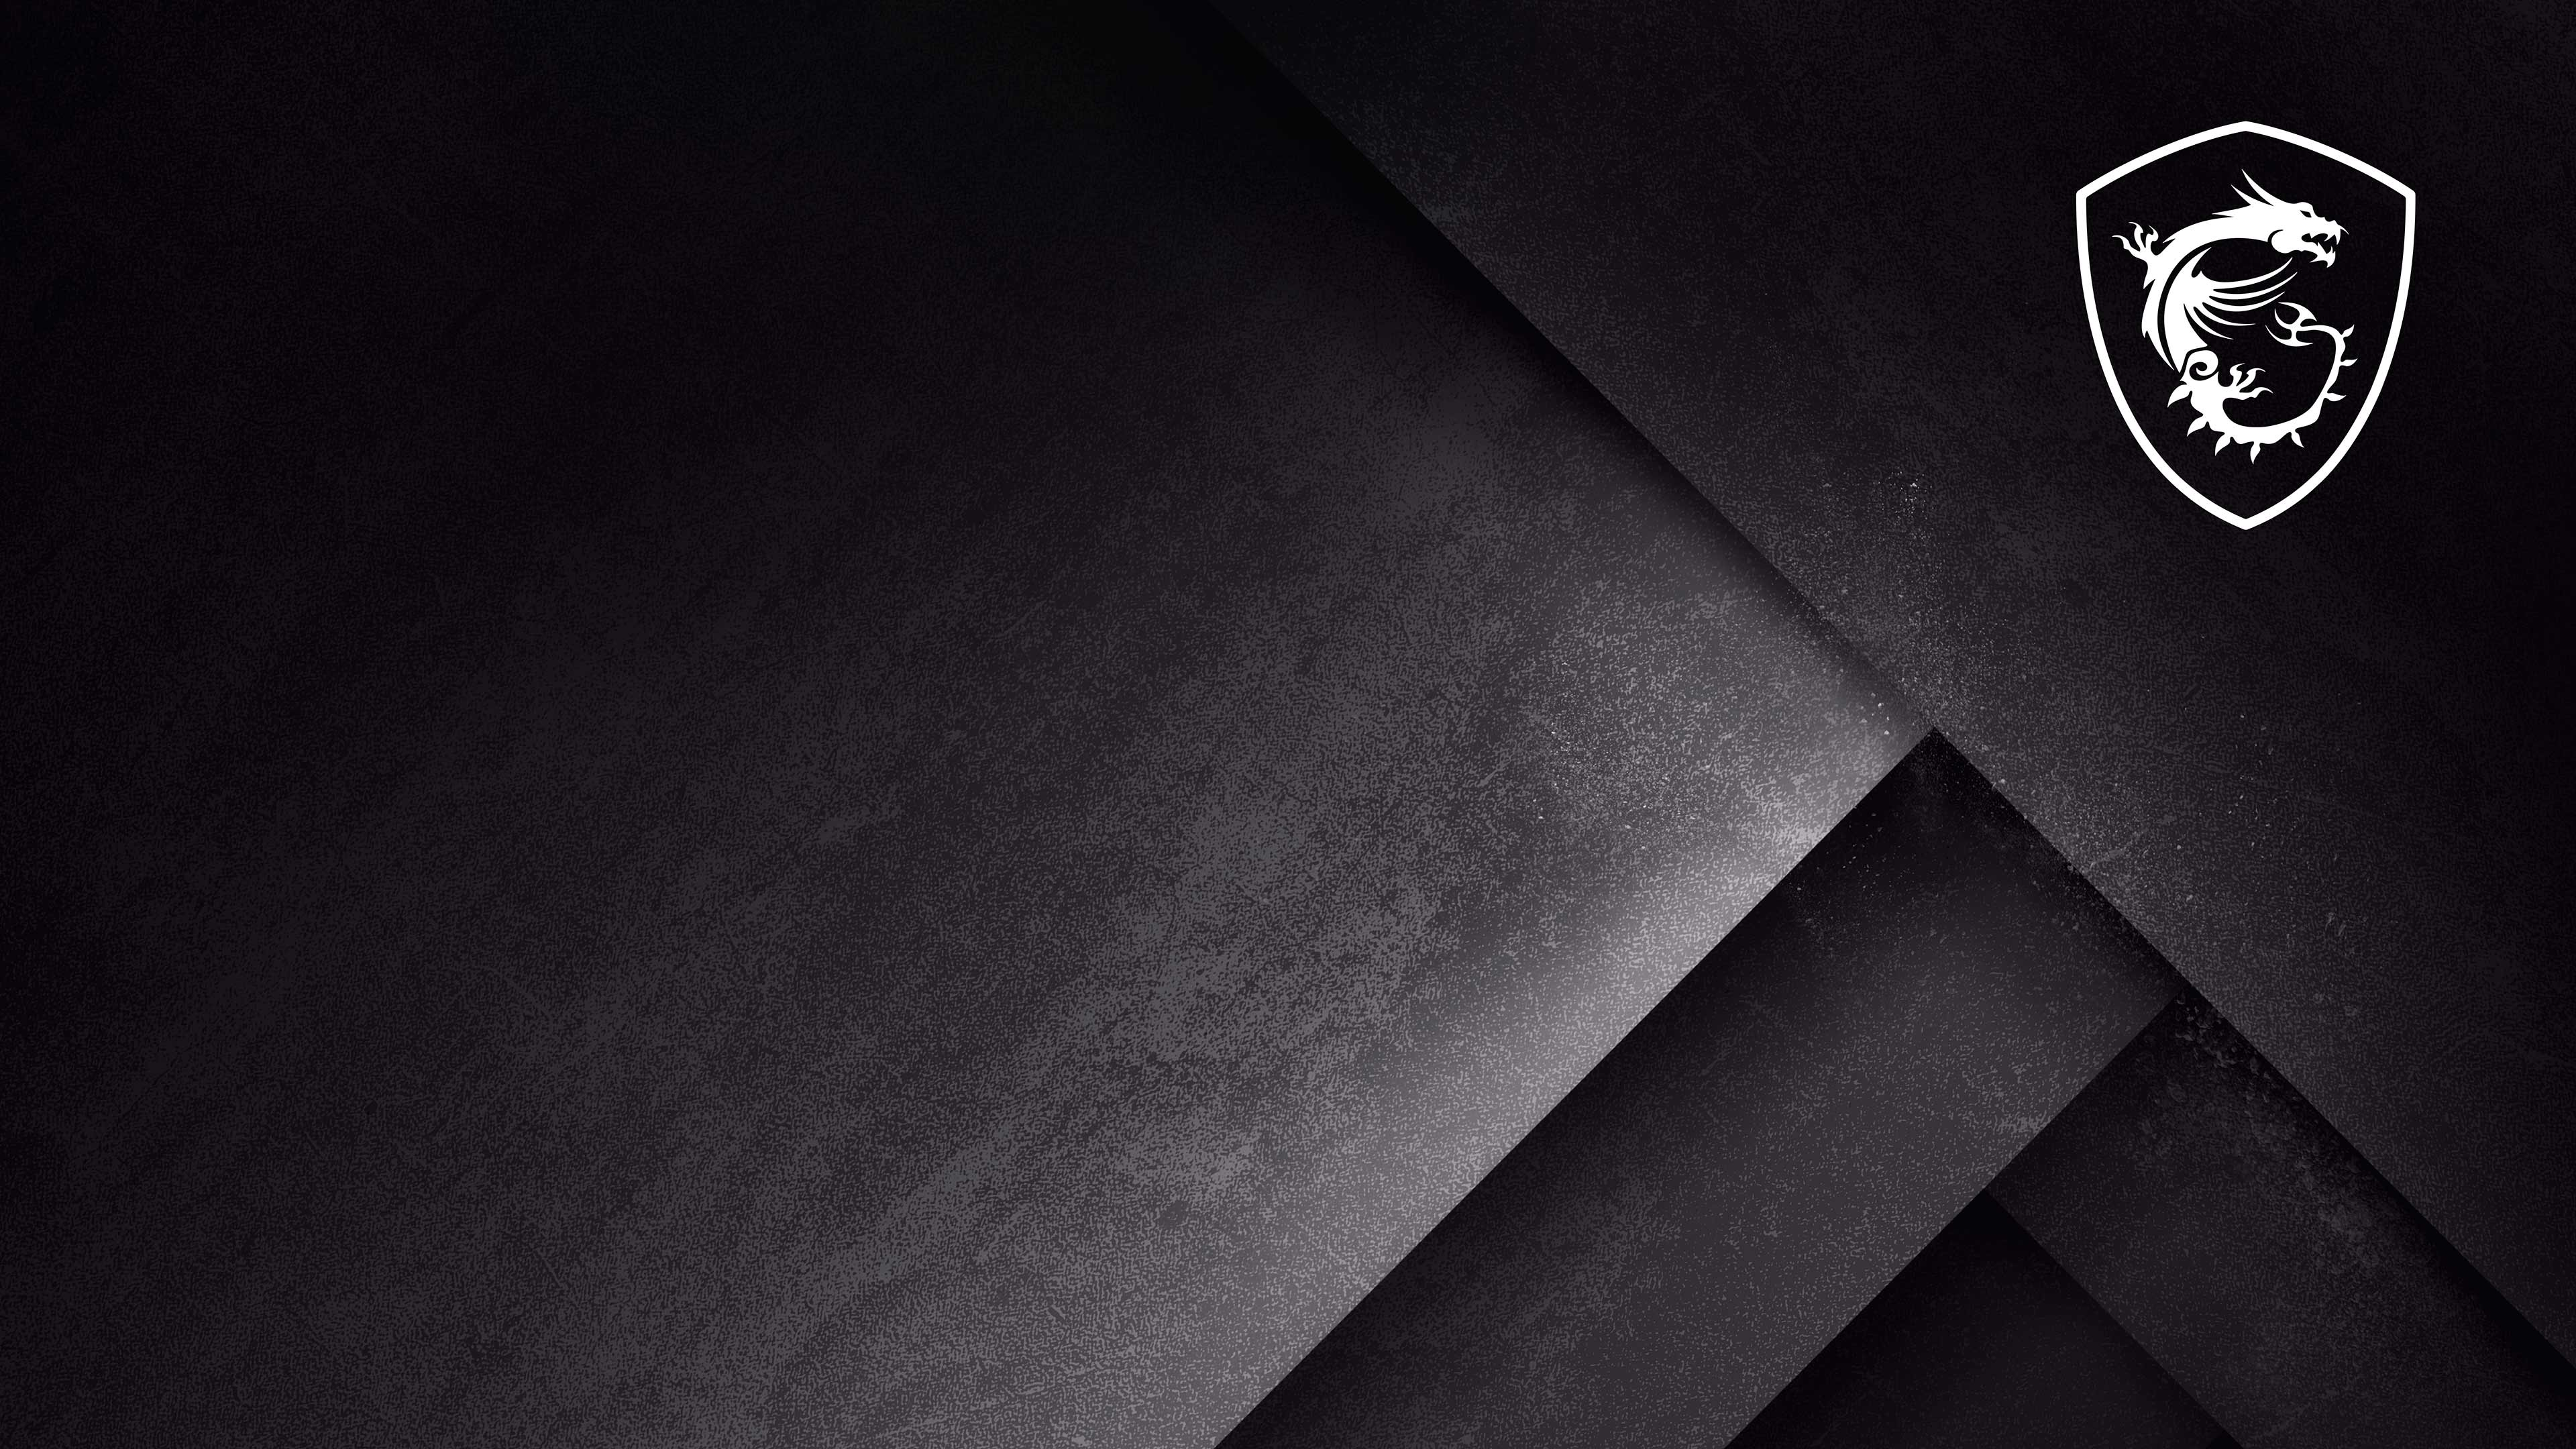 msi wallpaper size preview